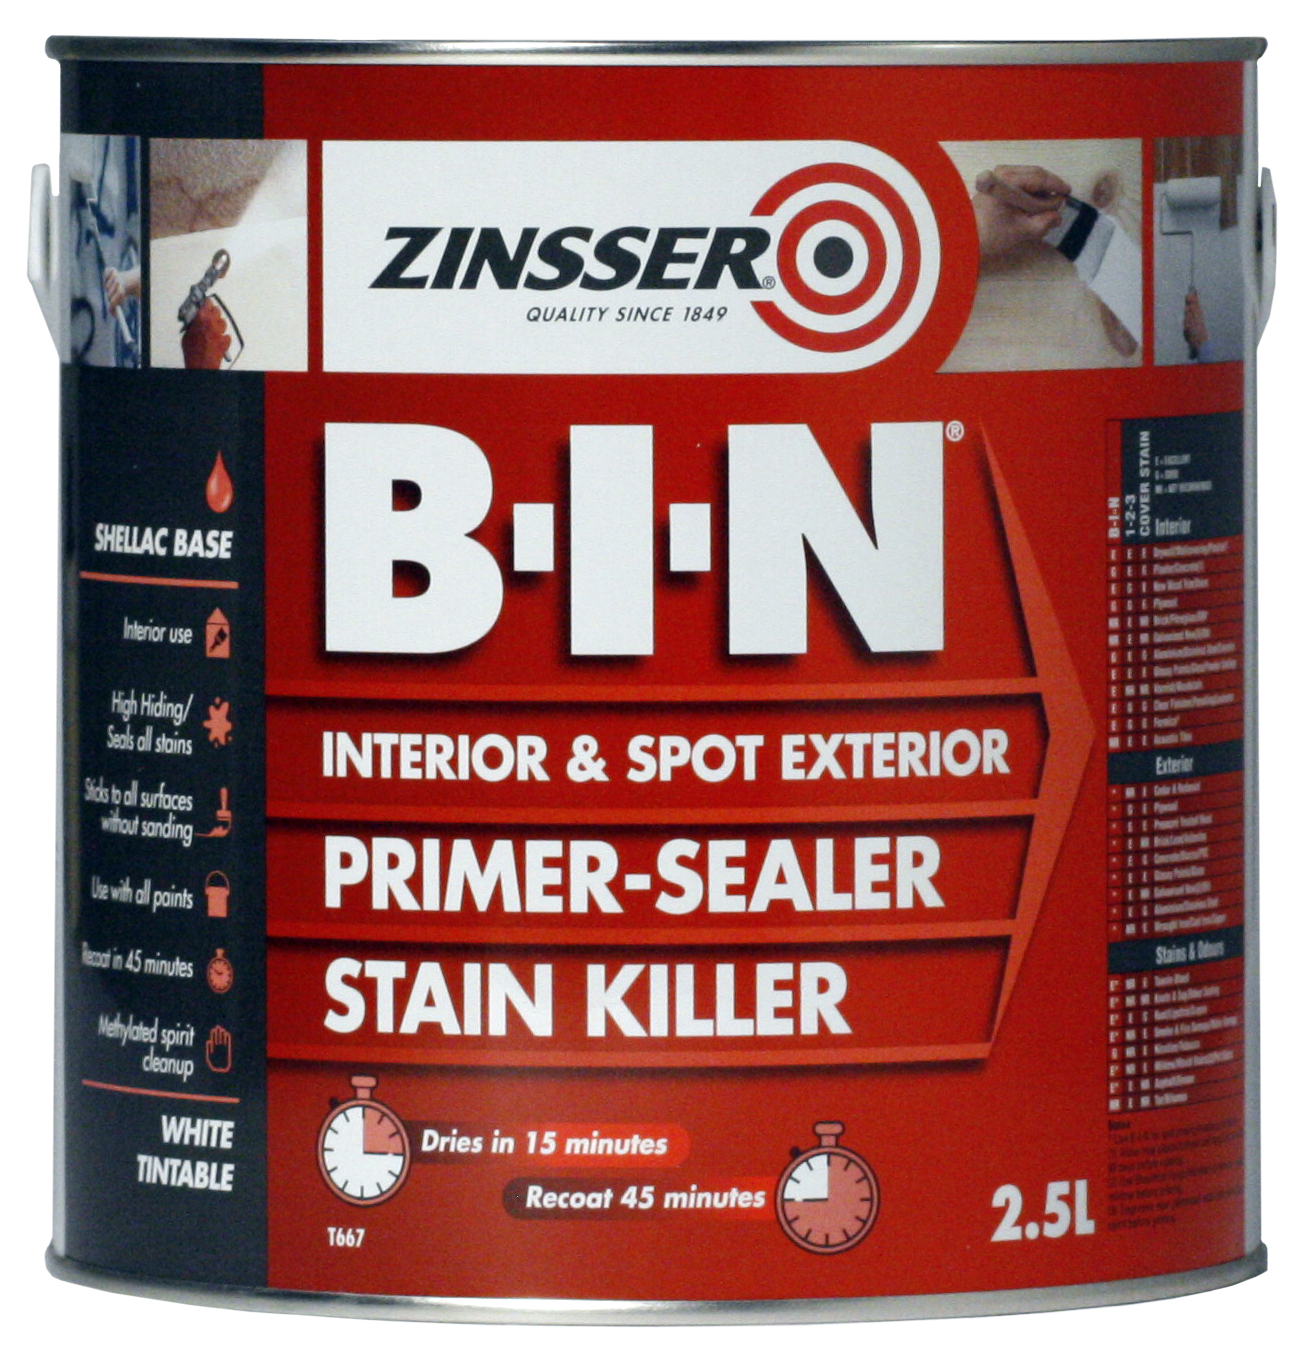 ZN610160 Zinsser BIN 2.5L